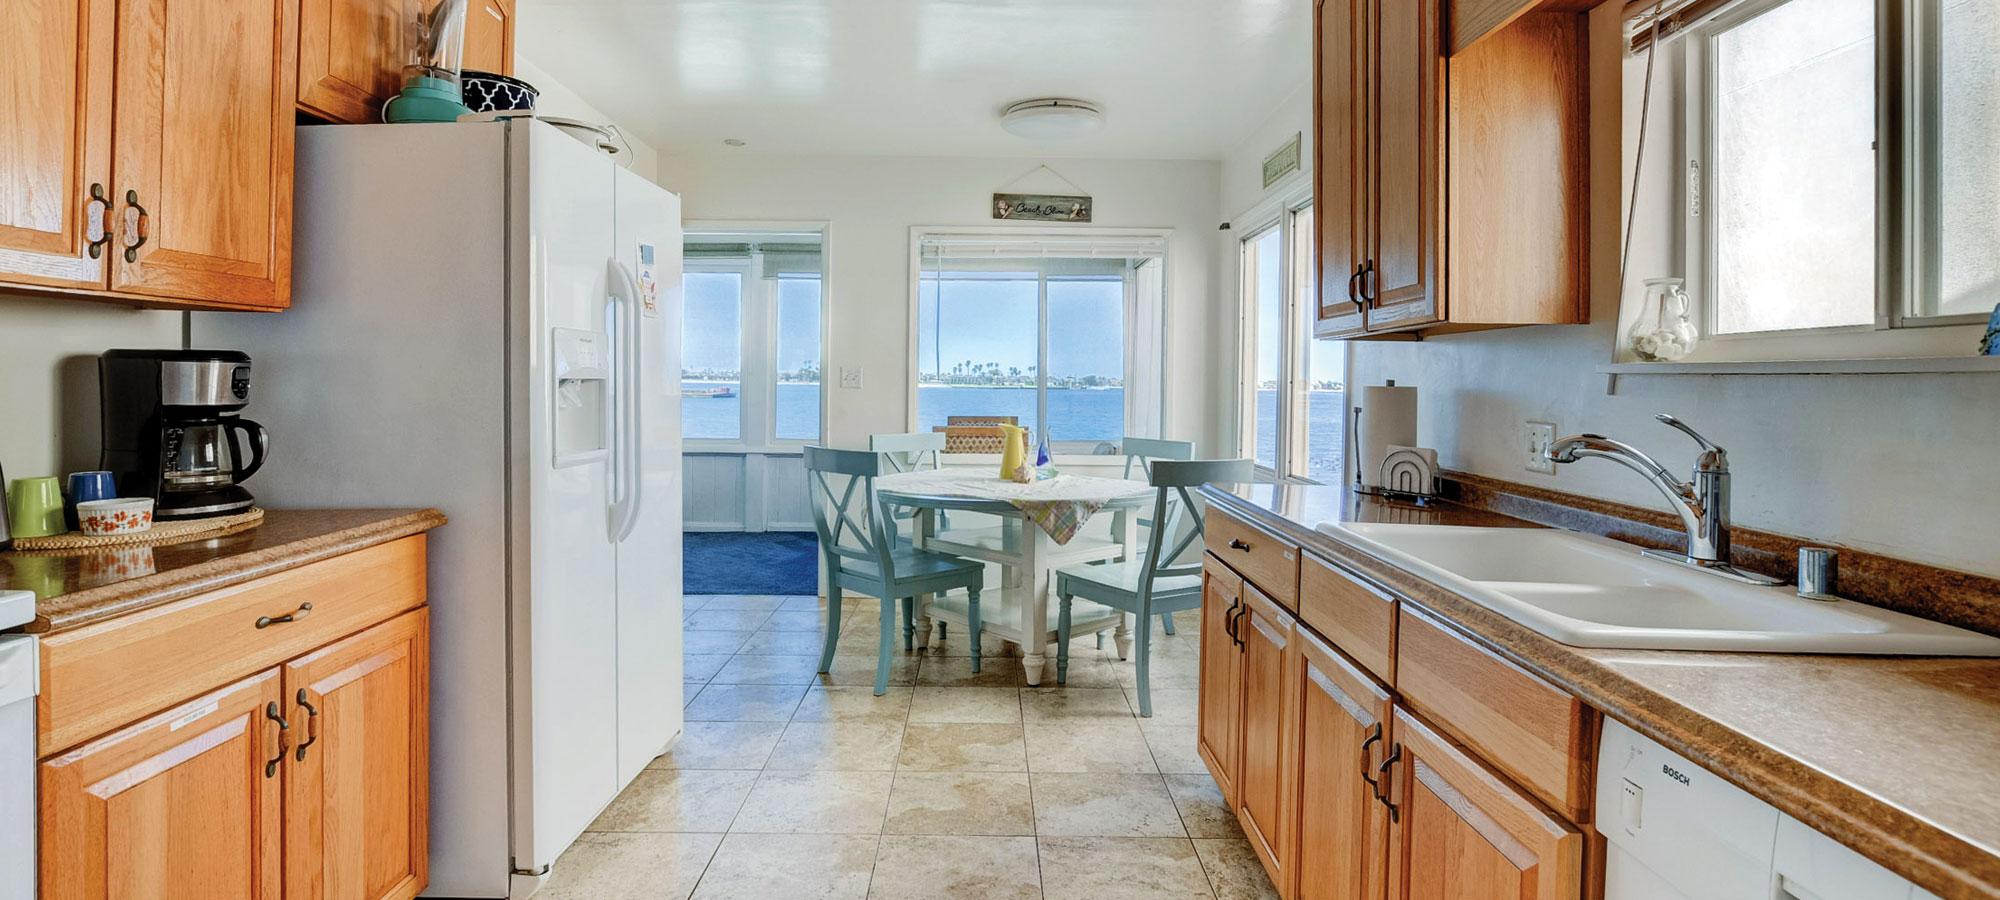 3712 Riviera Dr, San Diego, CA 92109